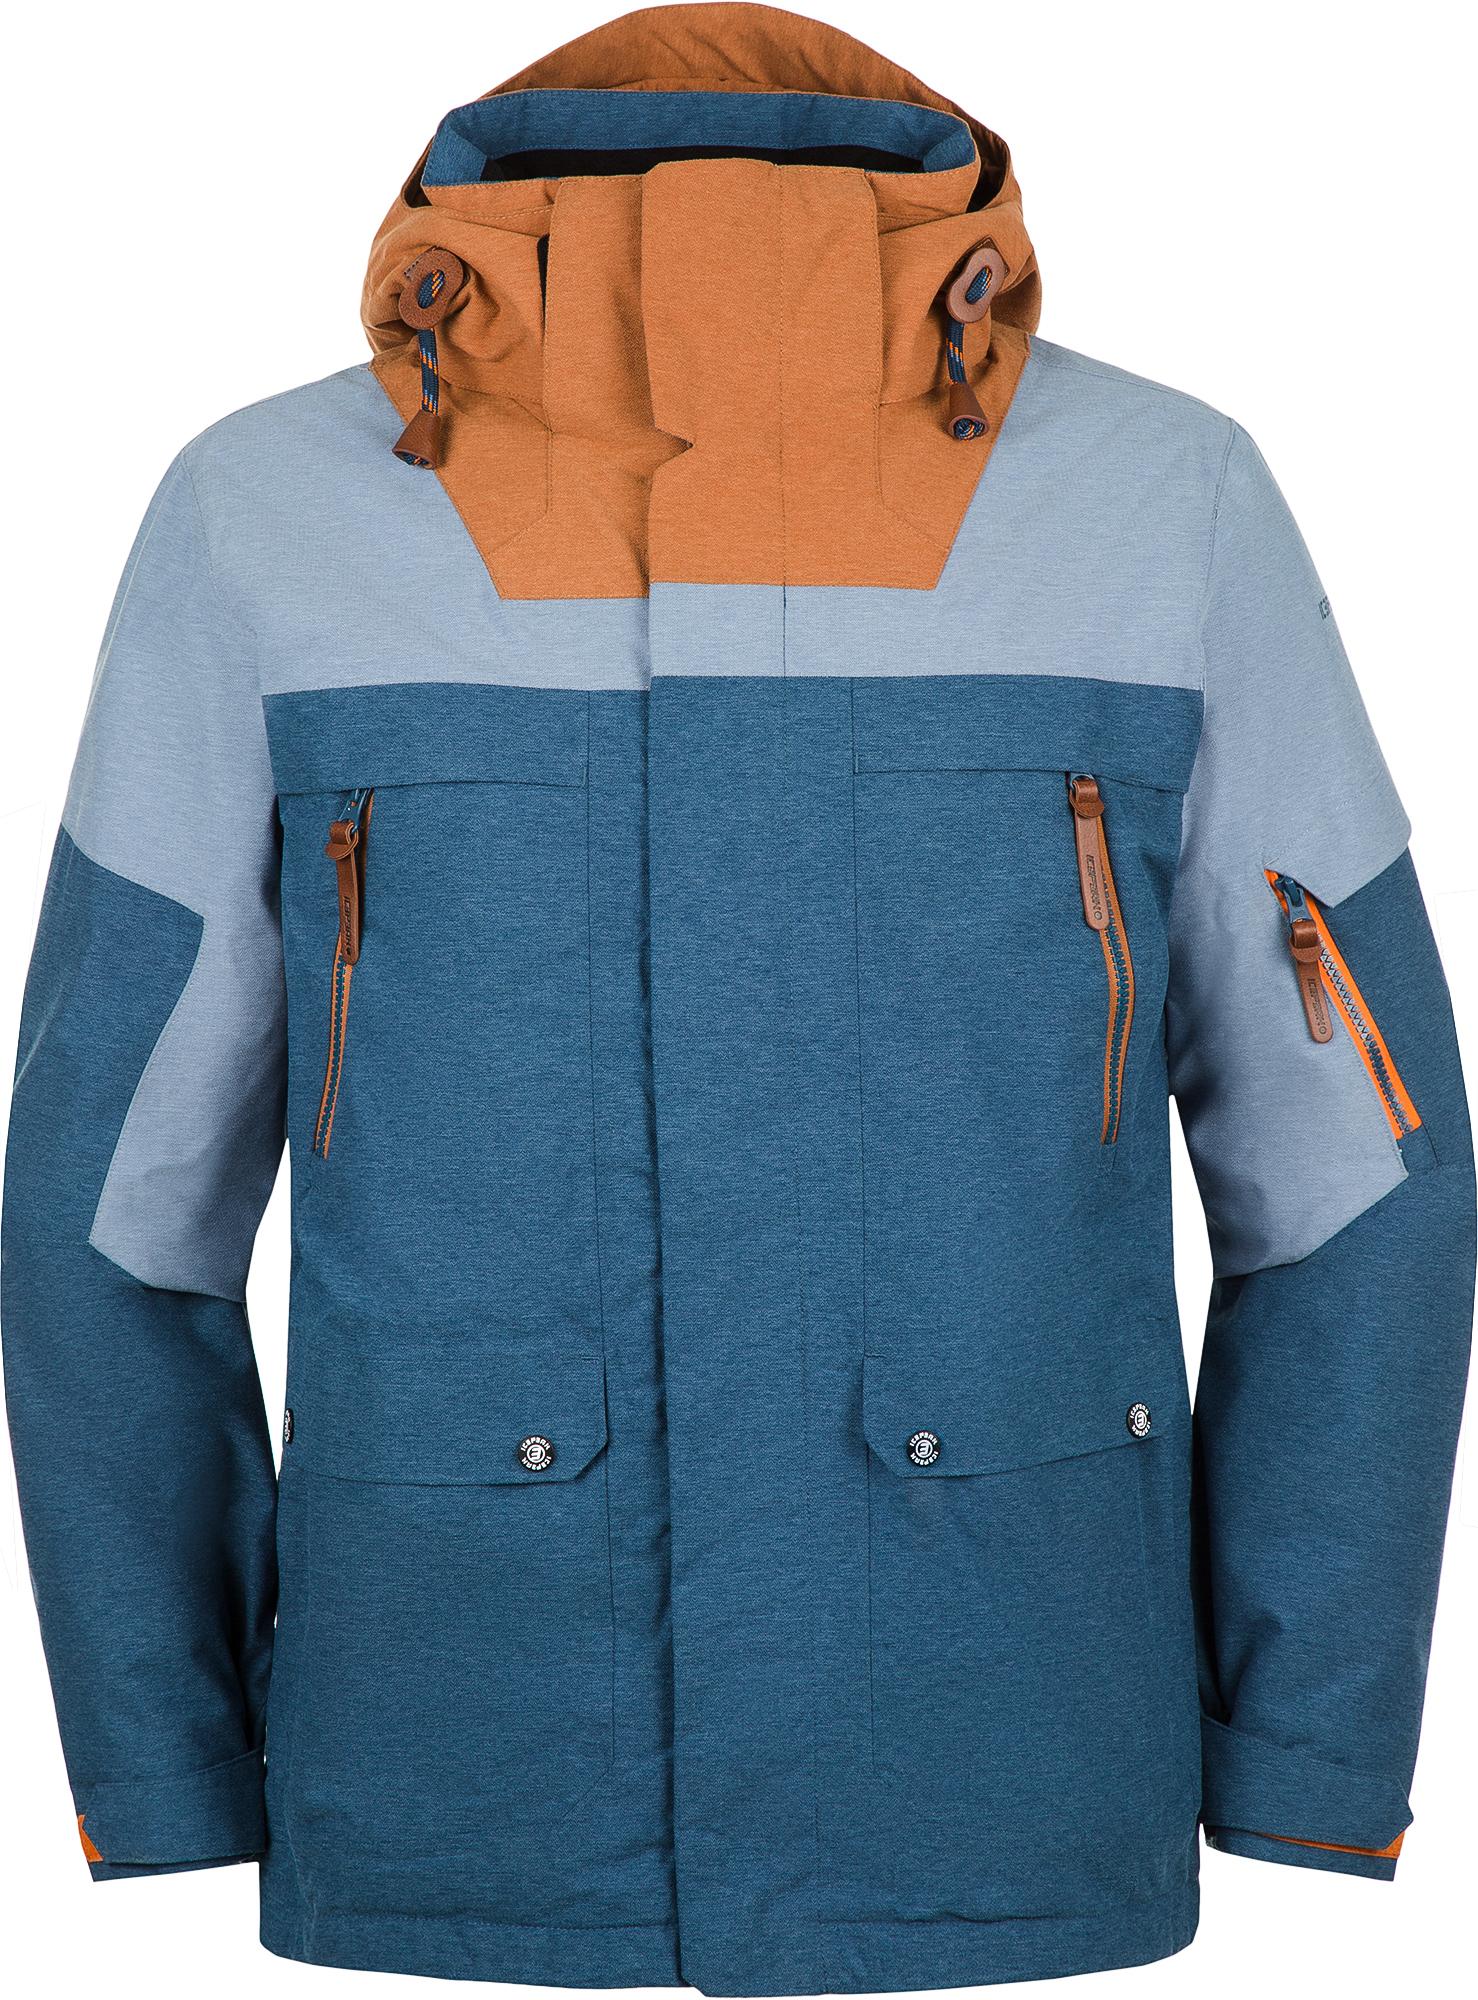 IcePeak Куртка мужская Clarkson, размер 54